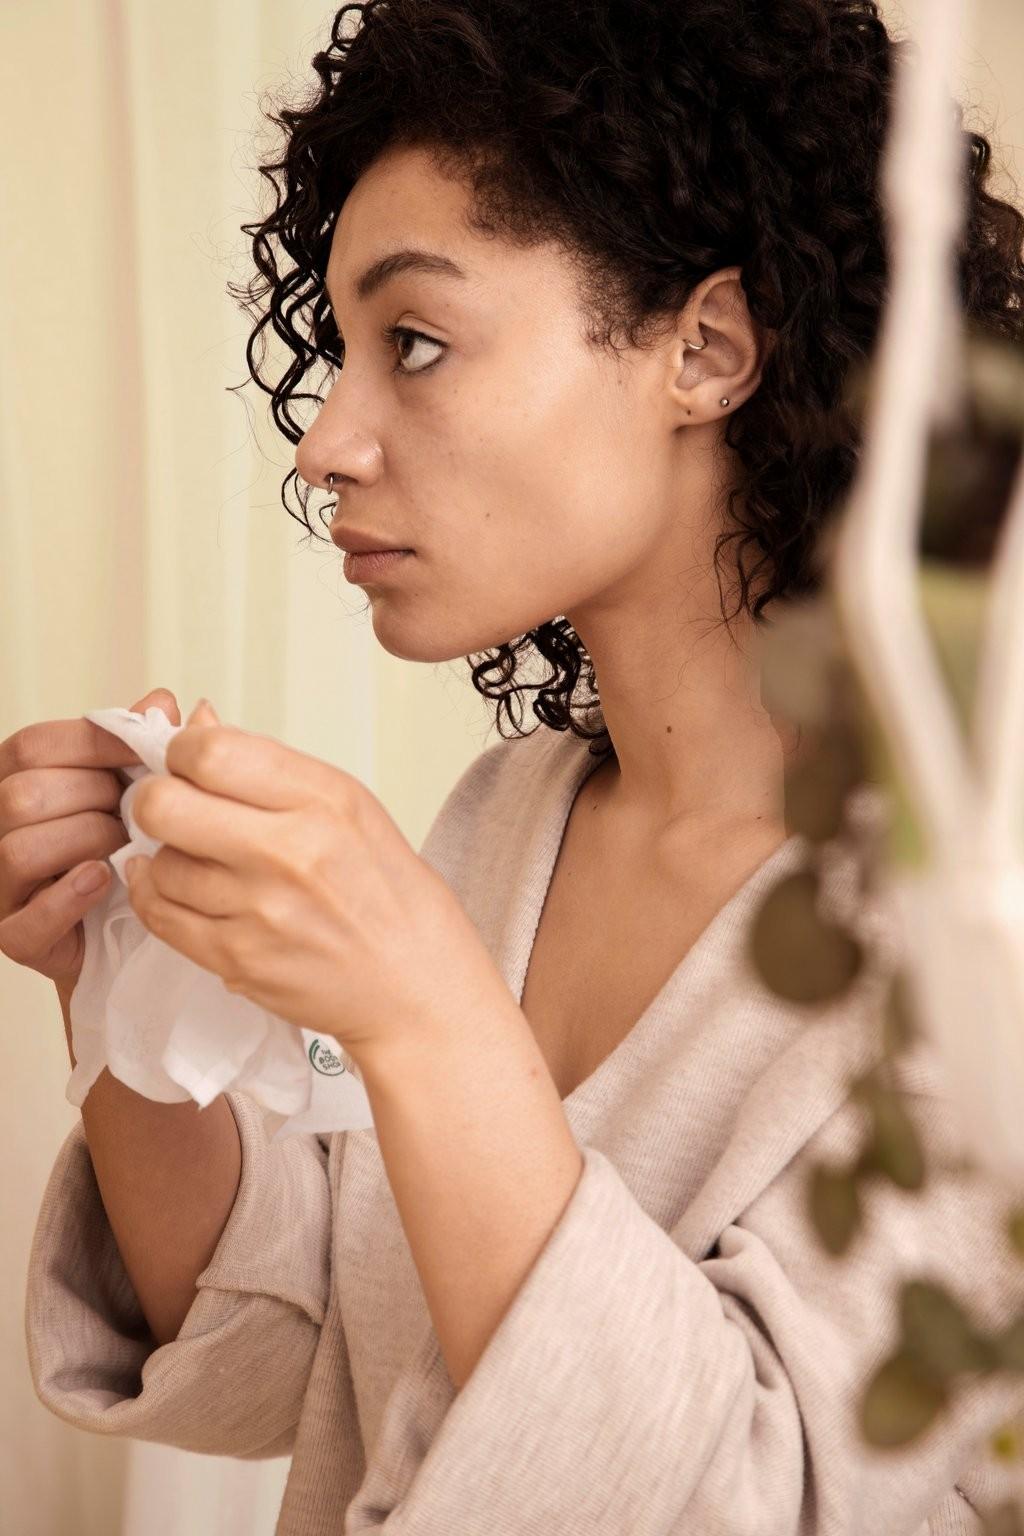 Mujer usando una toallita para maquillaje